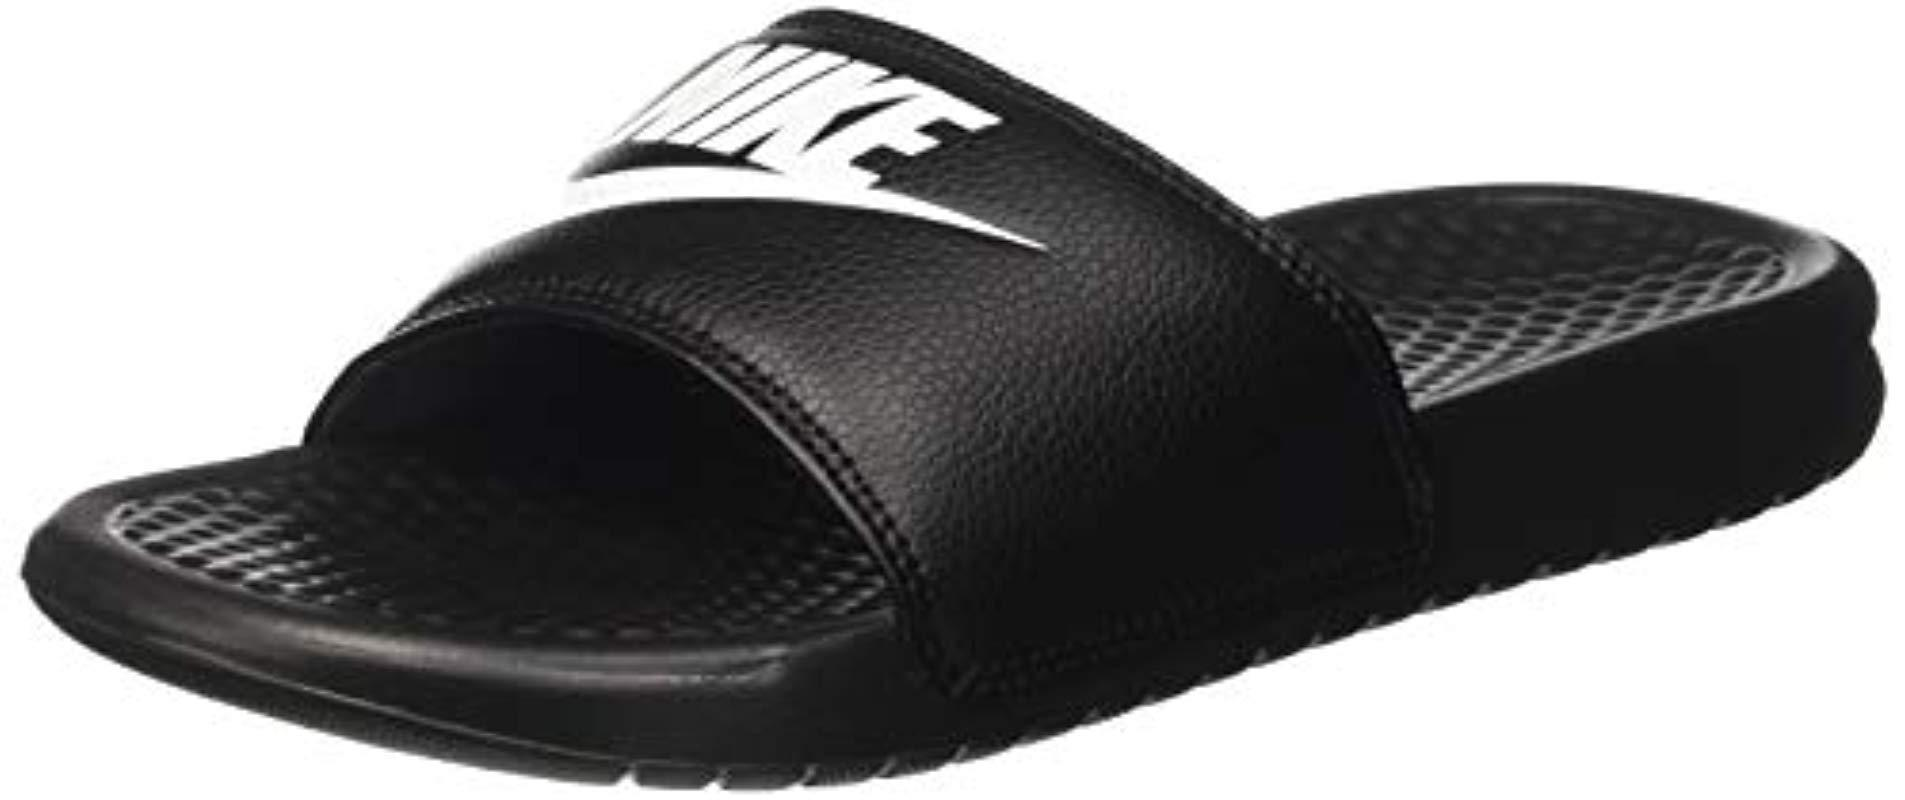 finest selection 51324 ebc54 Nike. Men s Black Benassi Just Do It Sandals